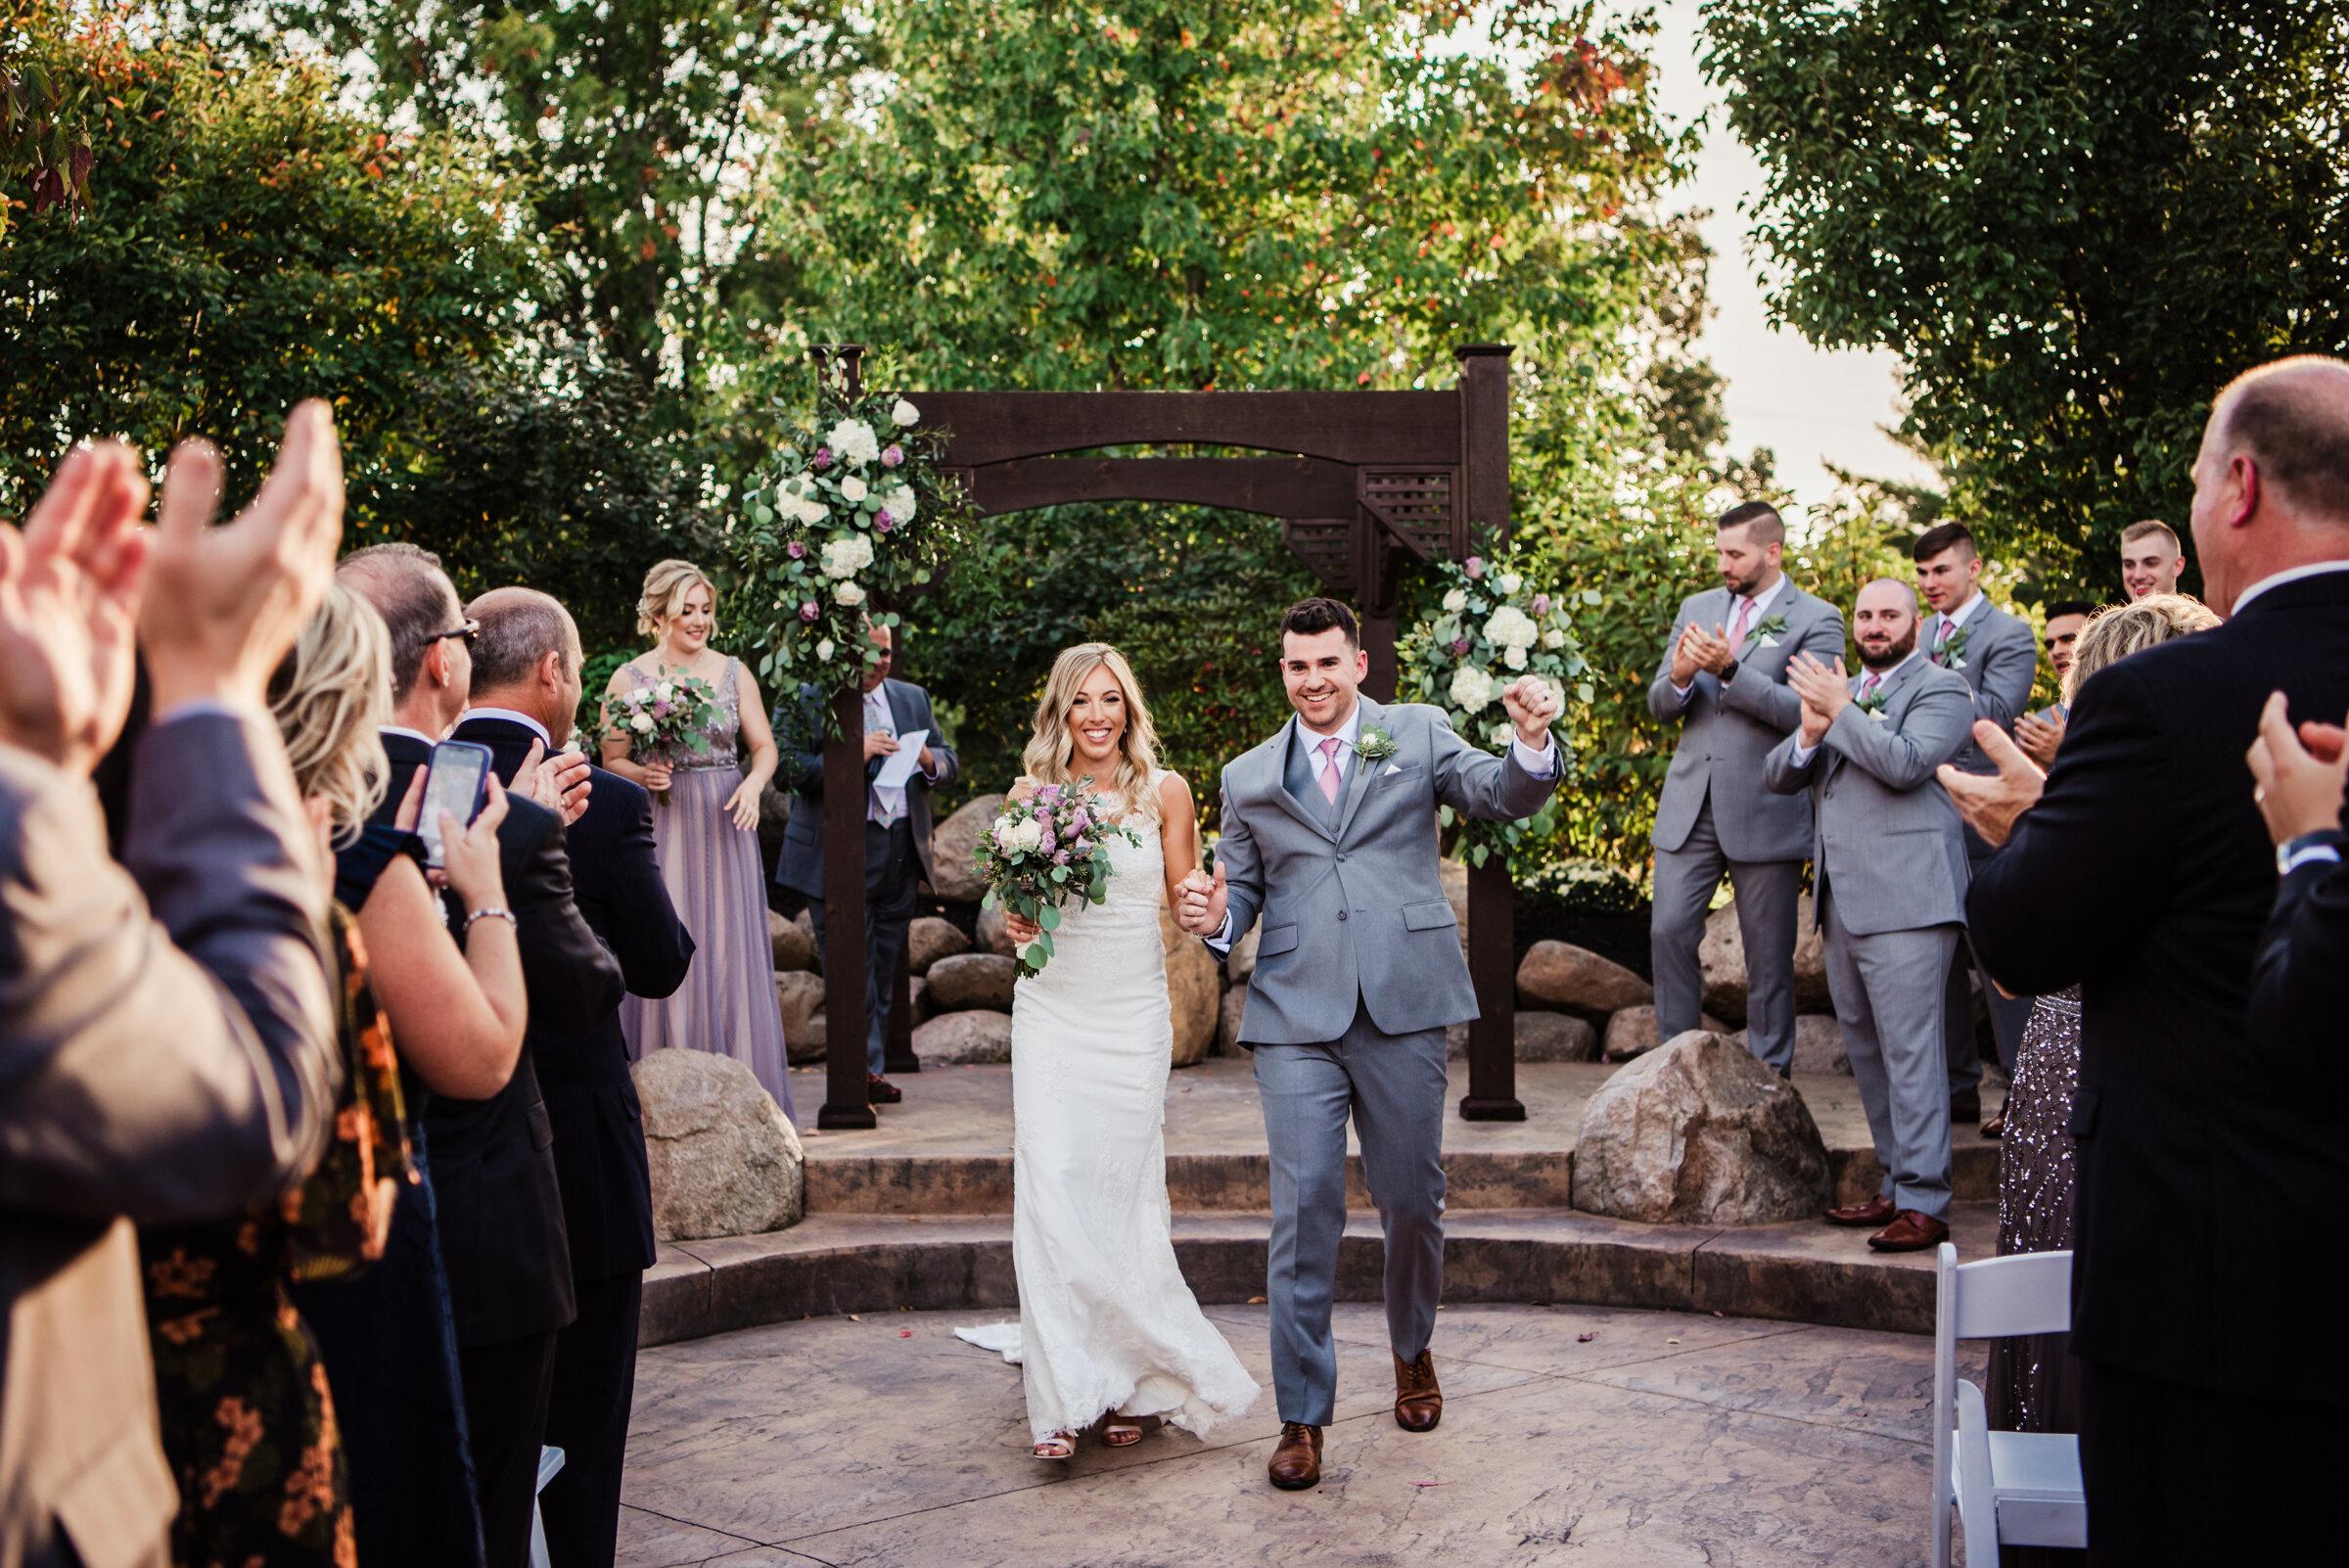 Deerfield_Country_Club_Rochester_Wedding_JILL_STUDIO_Rochester_NY_Photographer_DSC_6818.jpg